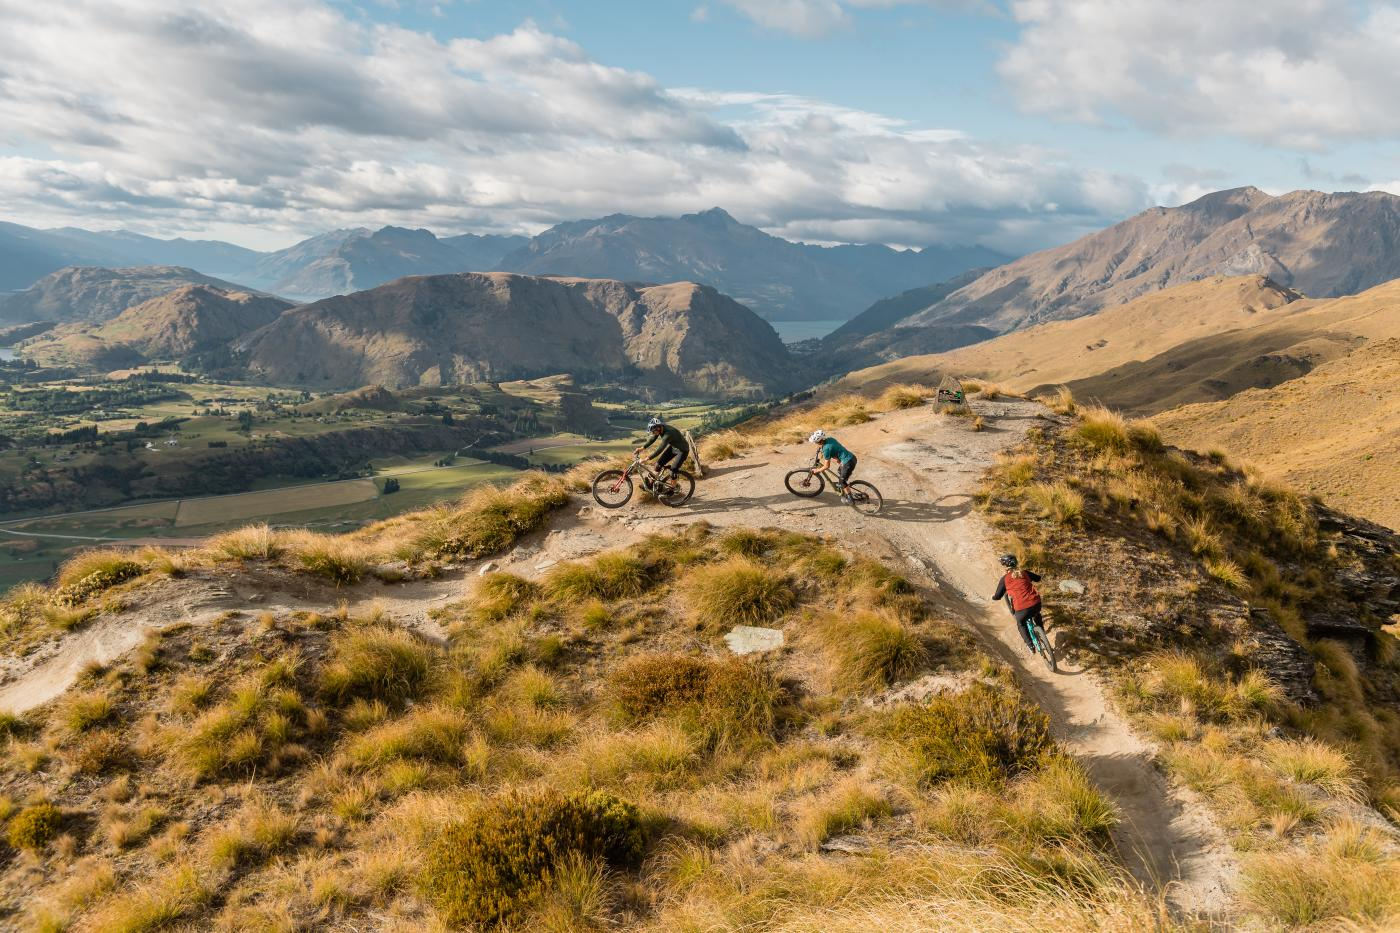 Riding Rude Rock, Coronet Peak